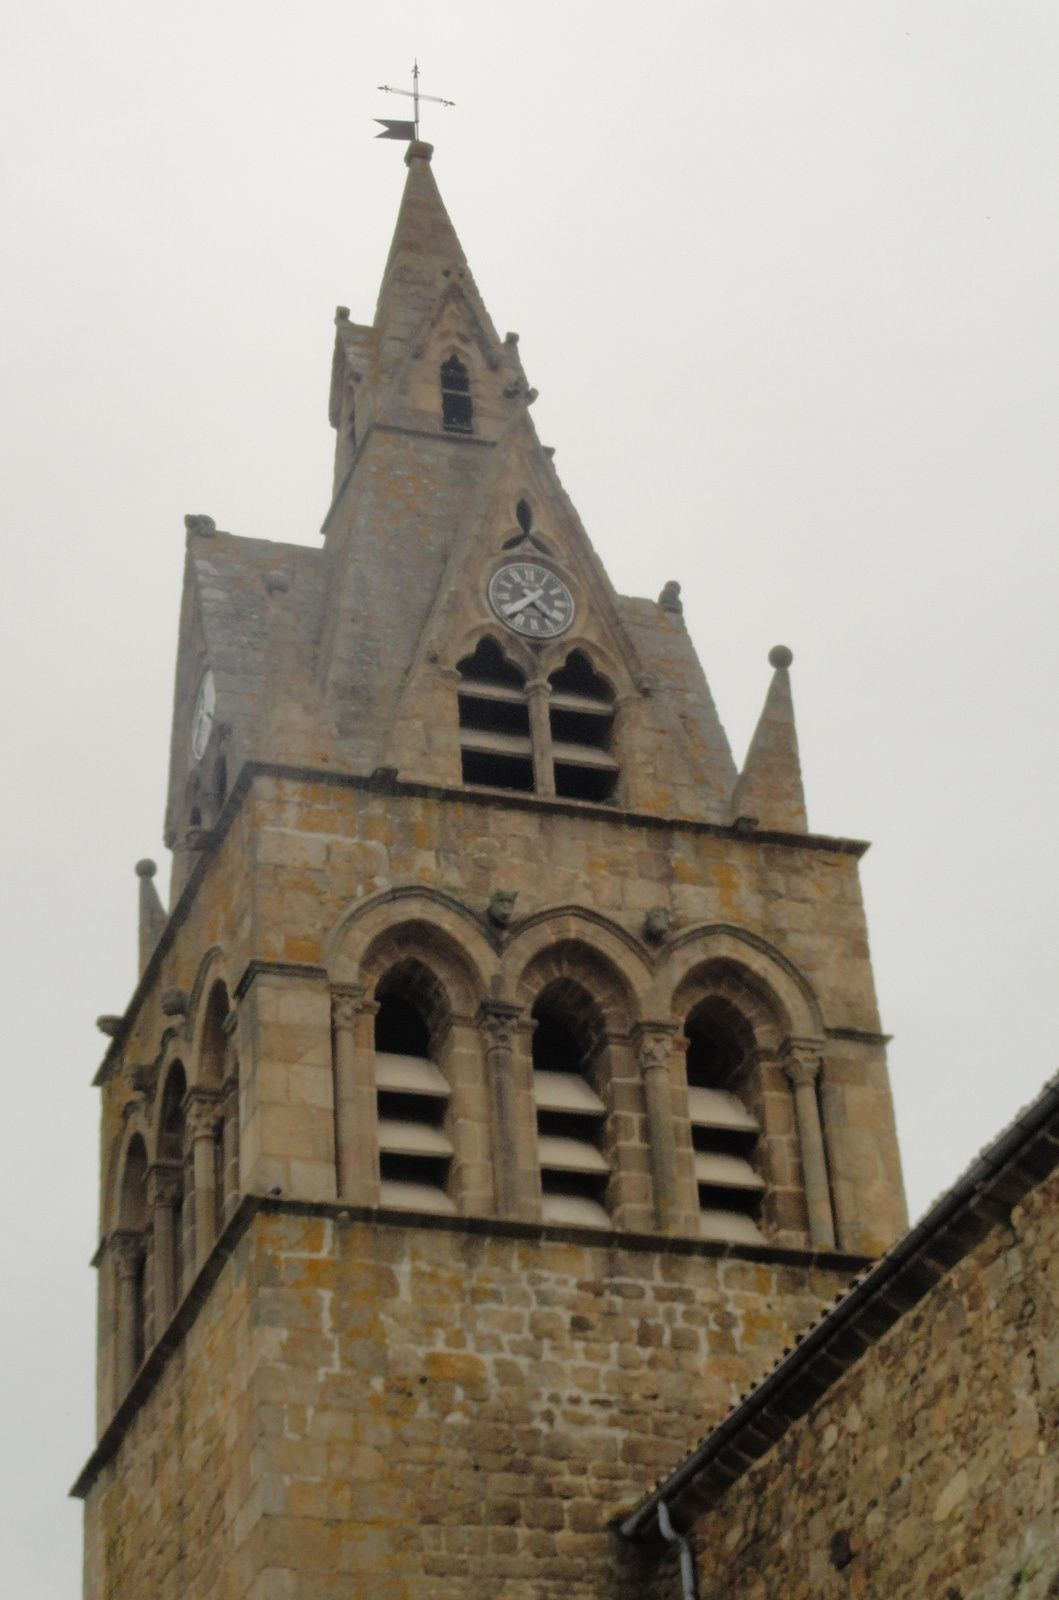 Joli clocher du quatorzième siècle.